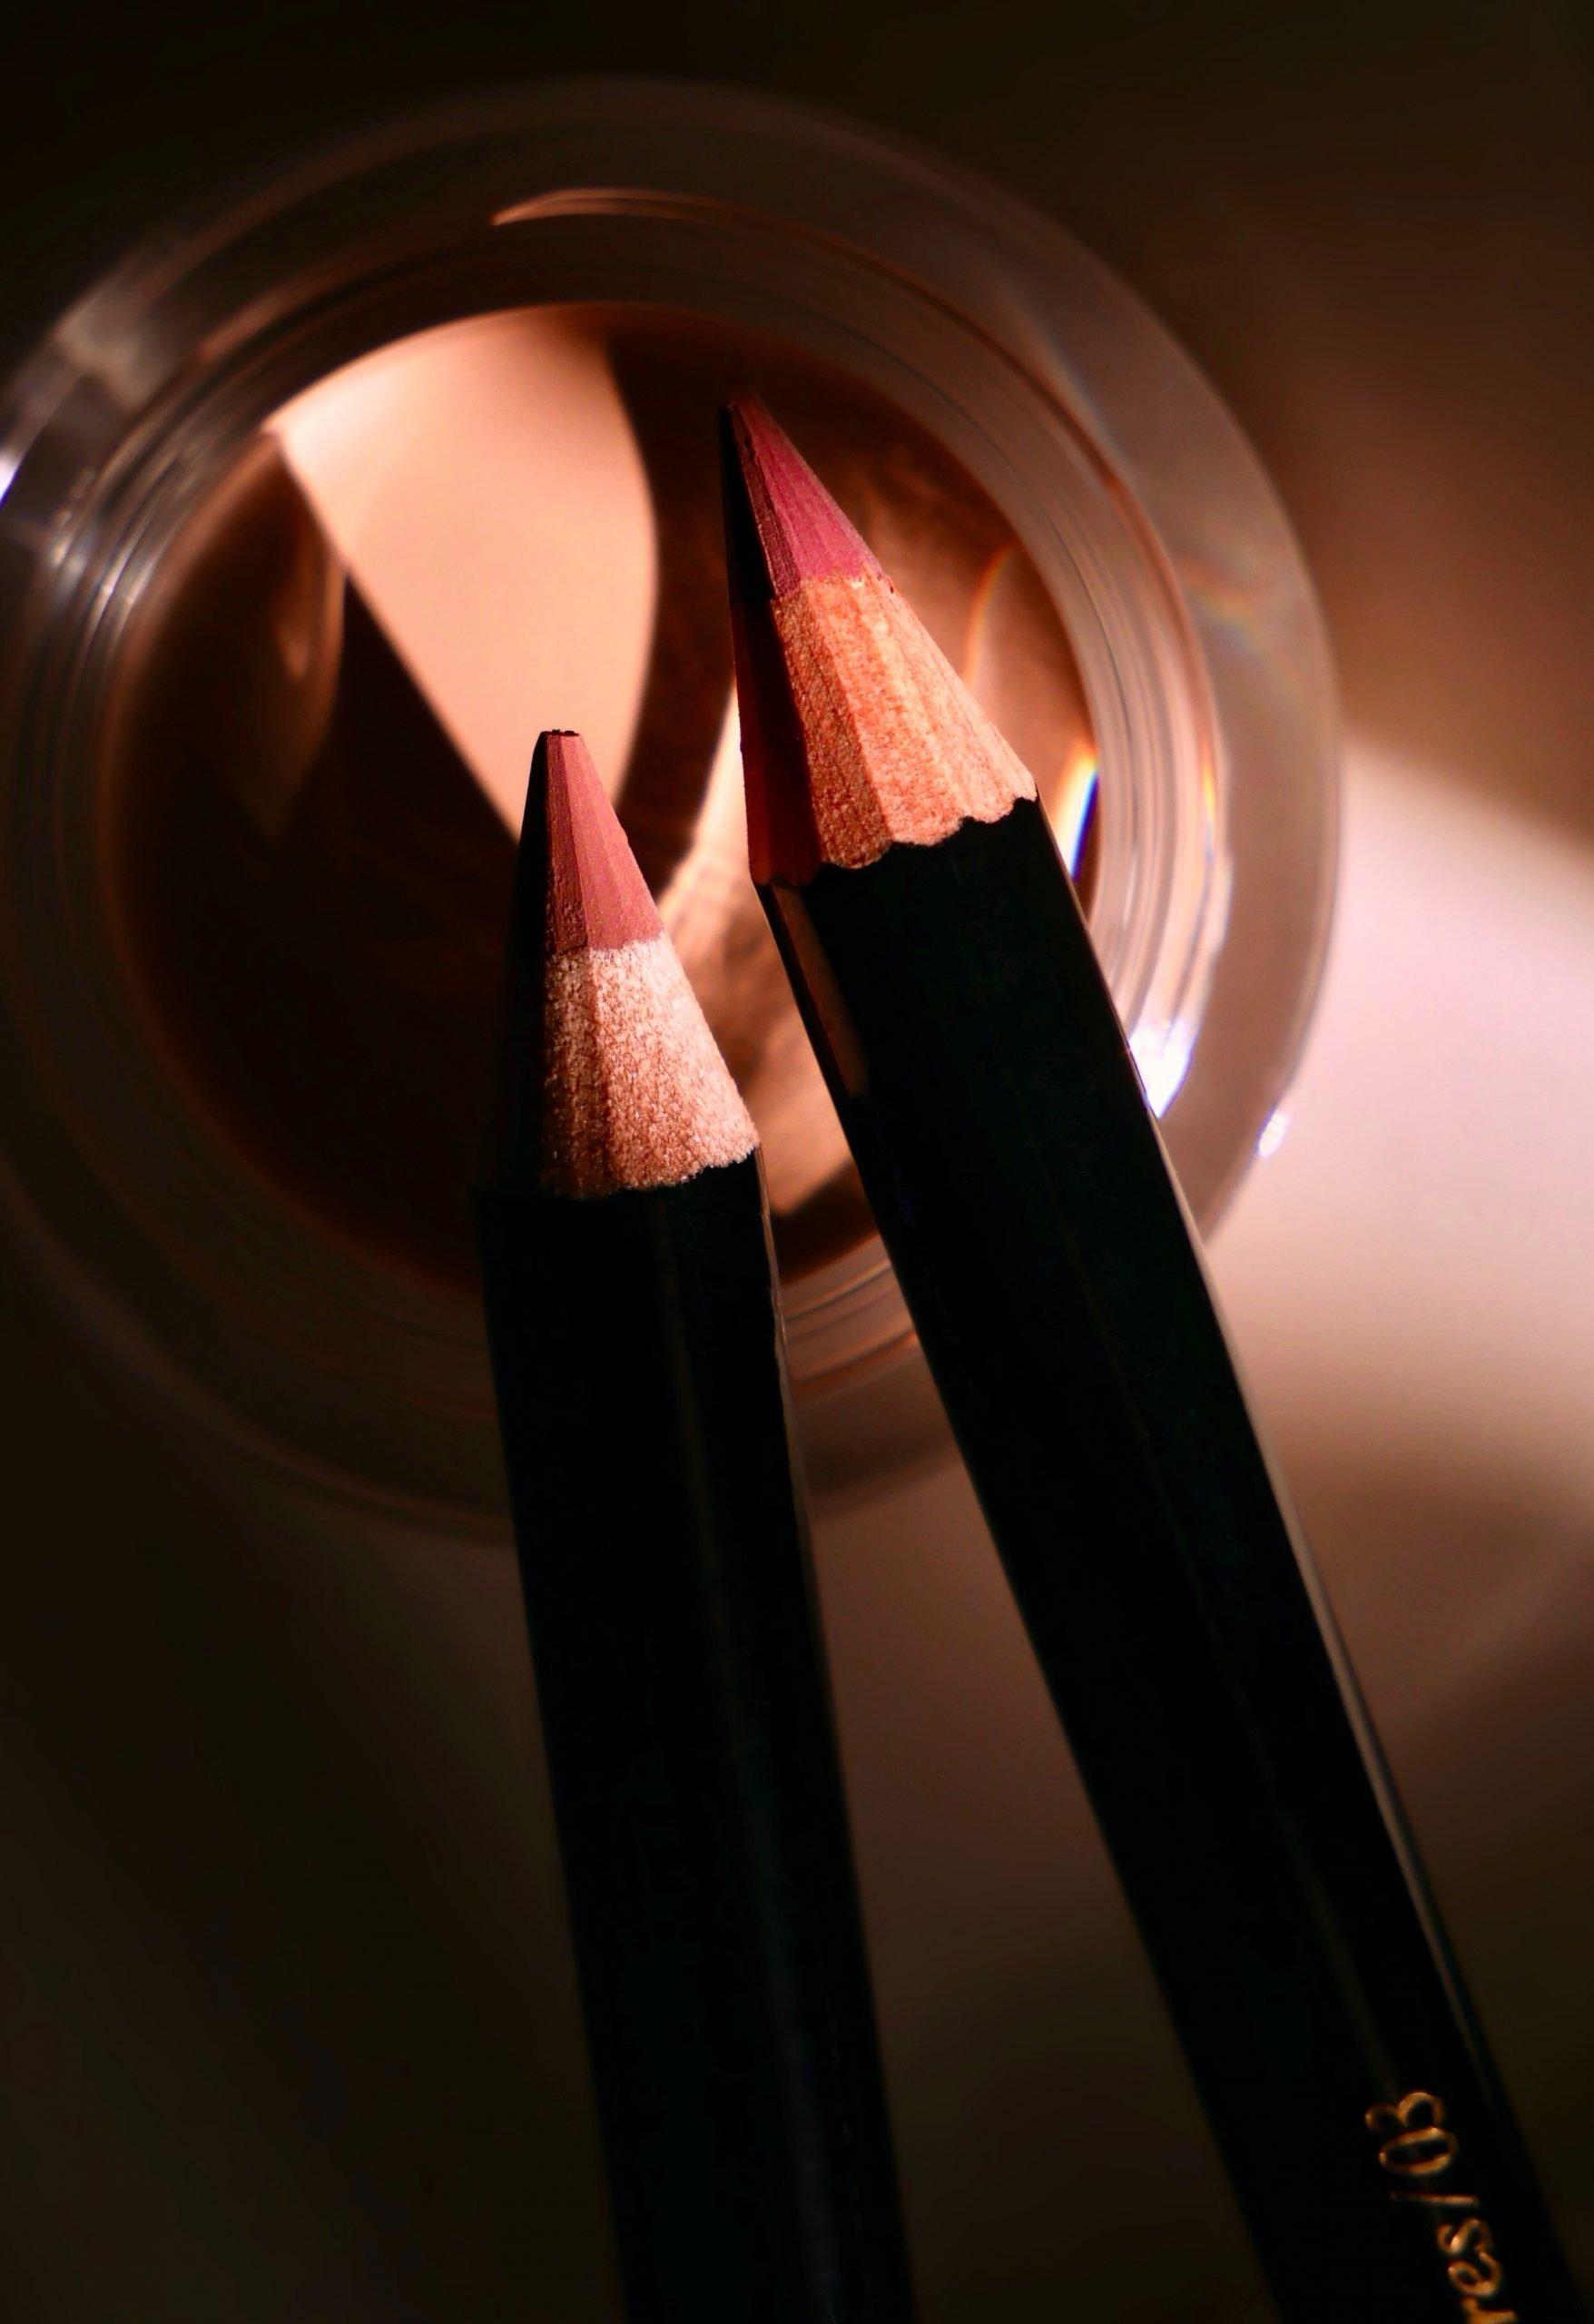 Victoria Beckham Beauty Lip Definer 02, 03, Tori Vale